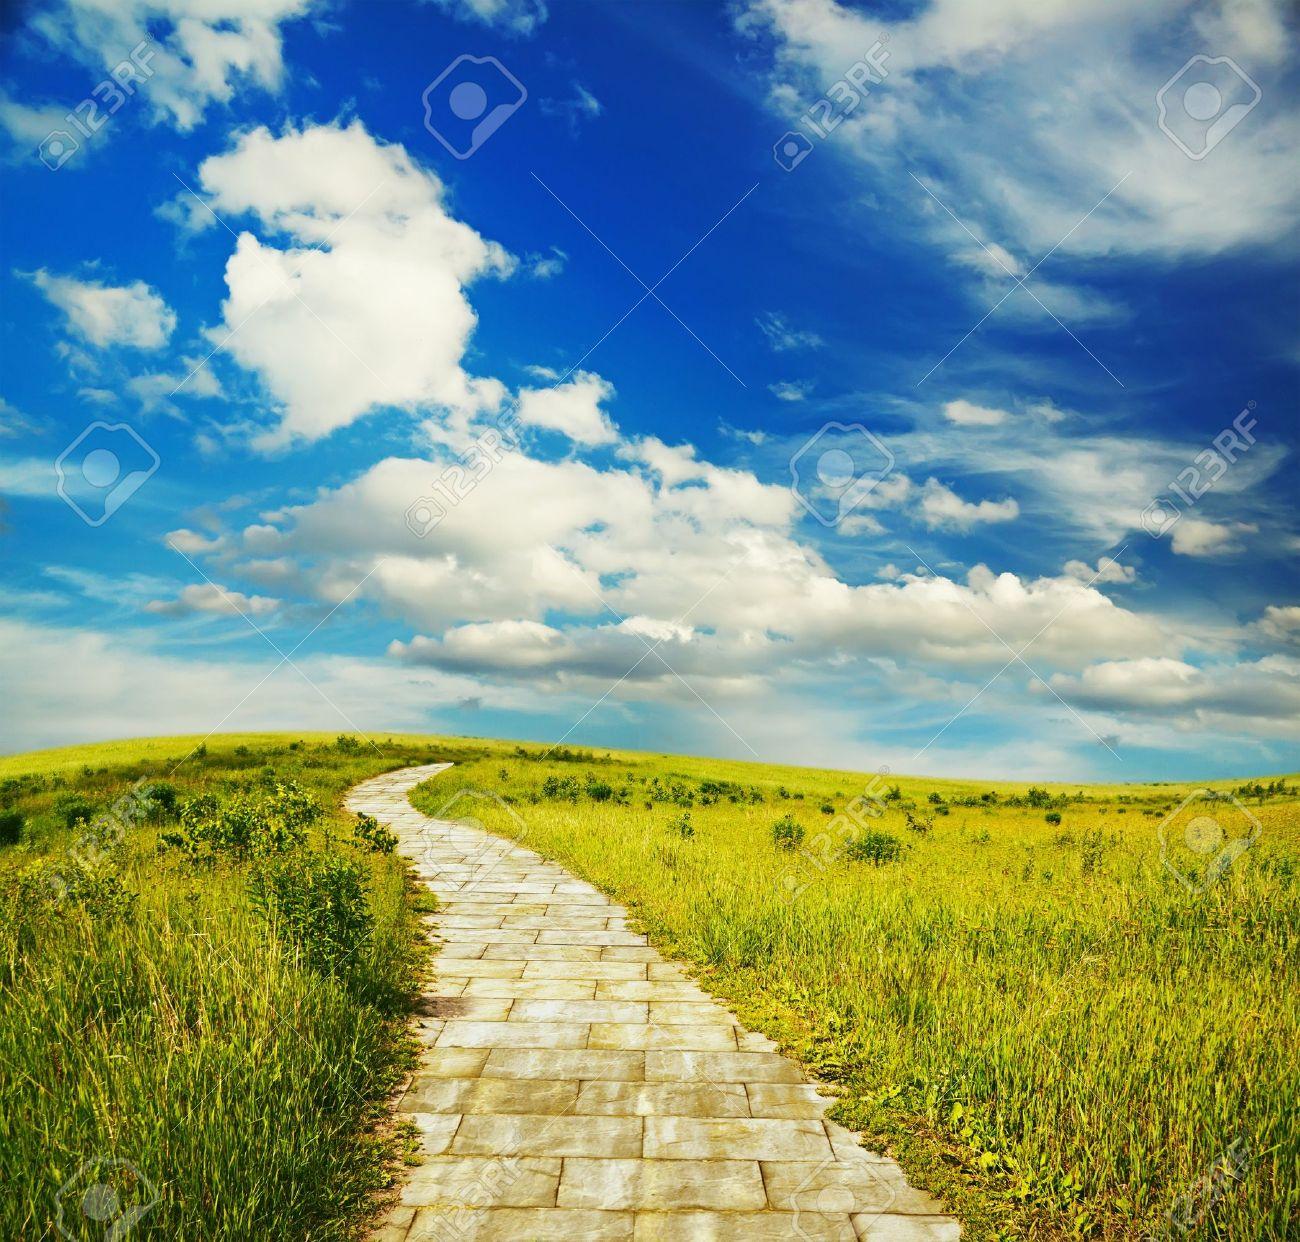 yellow brick road through green meadows, fantasy background - 10813225